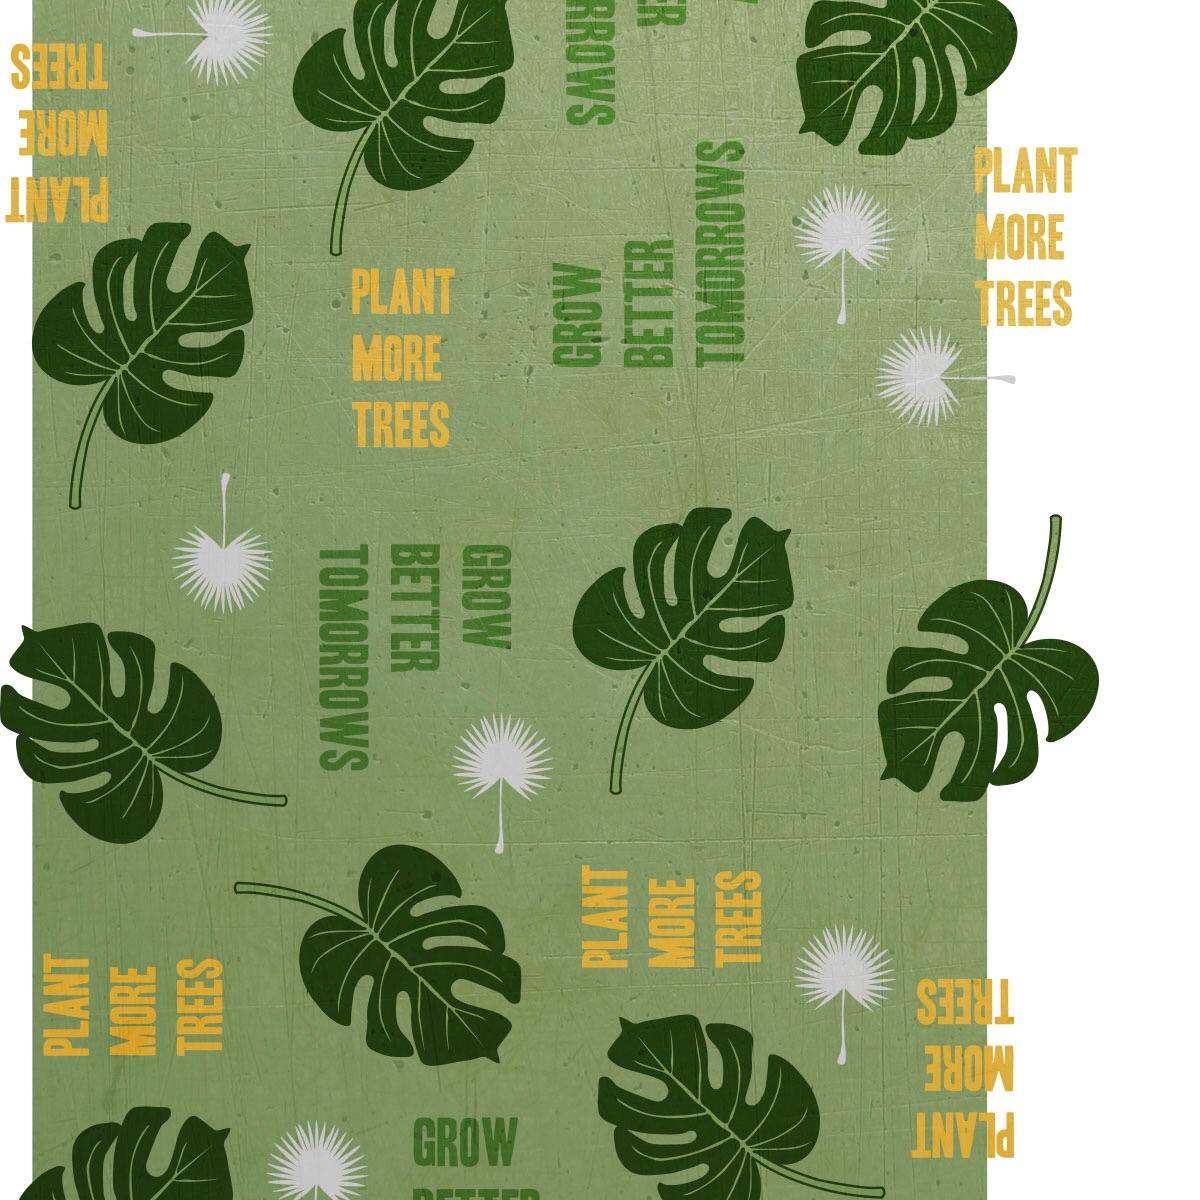 Plant More Trees.JPG